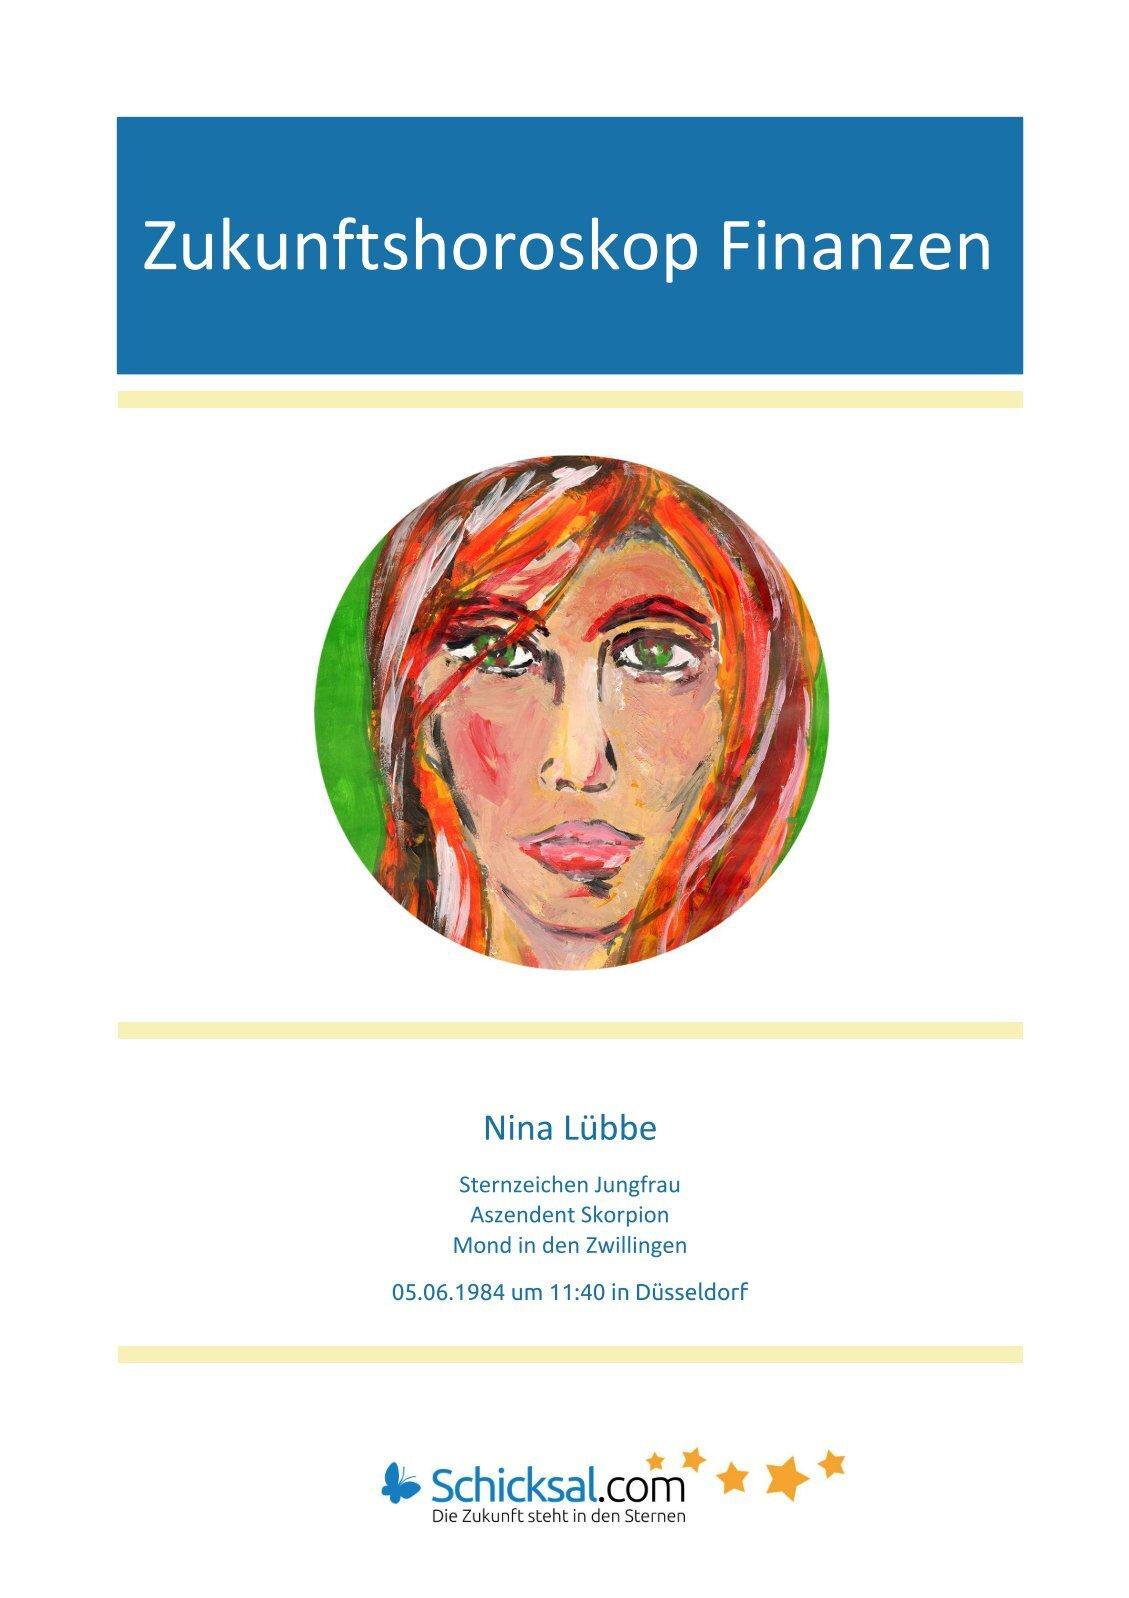 Zukunftshoroskop Finanzen Nina